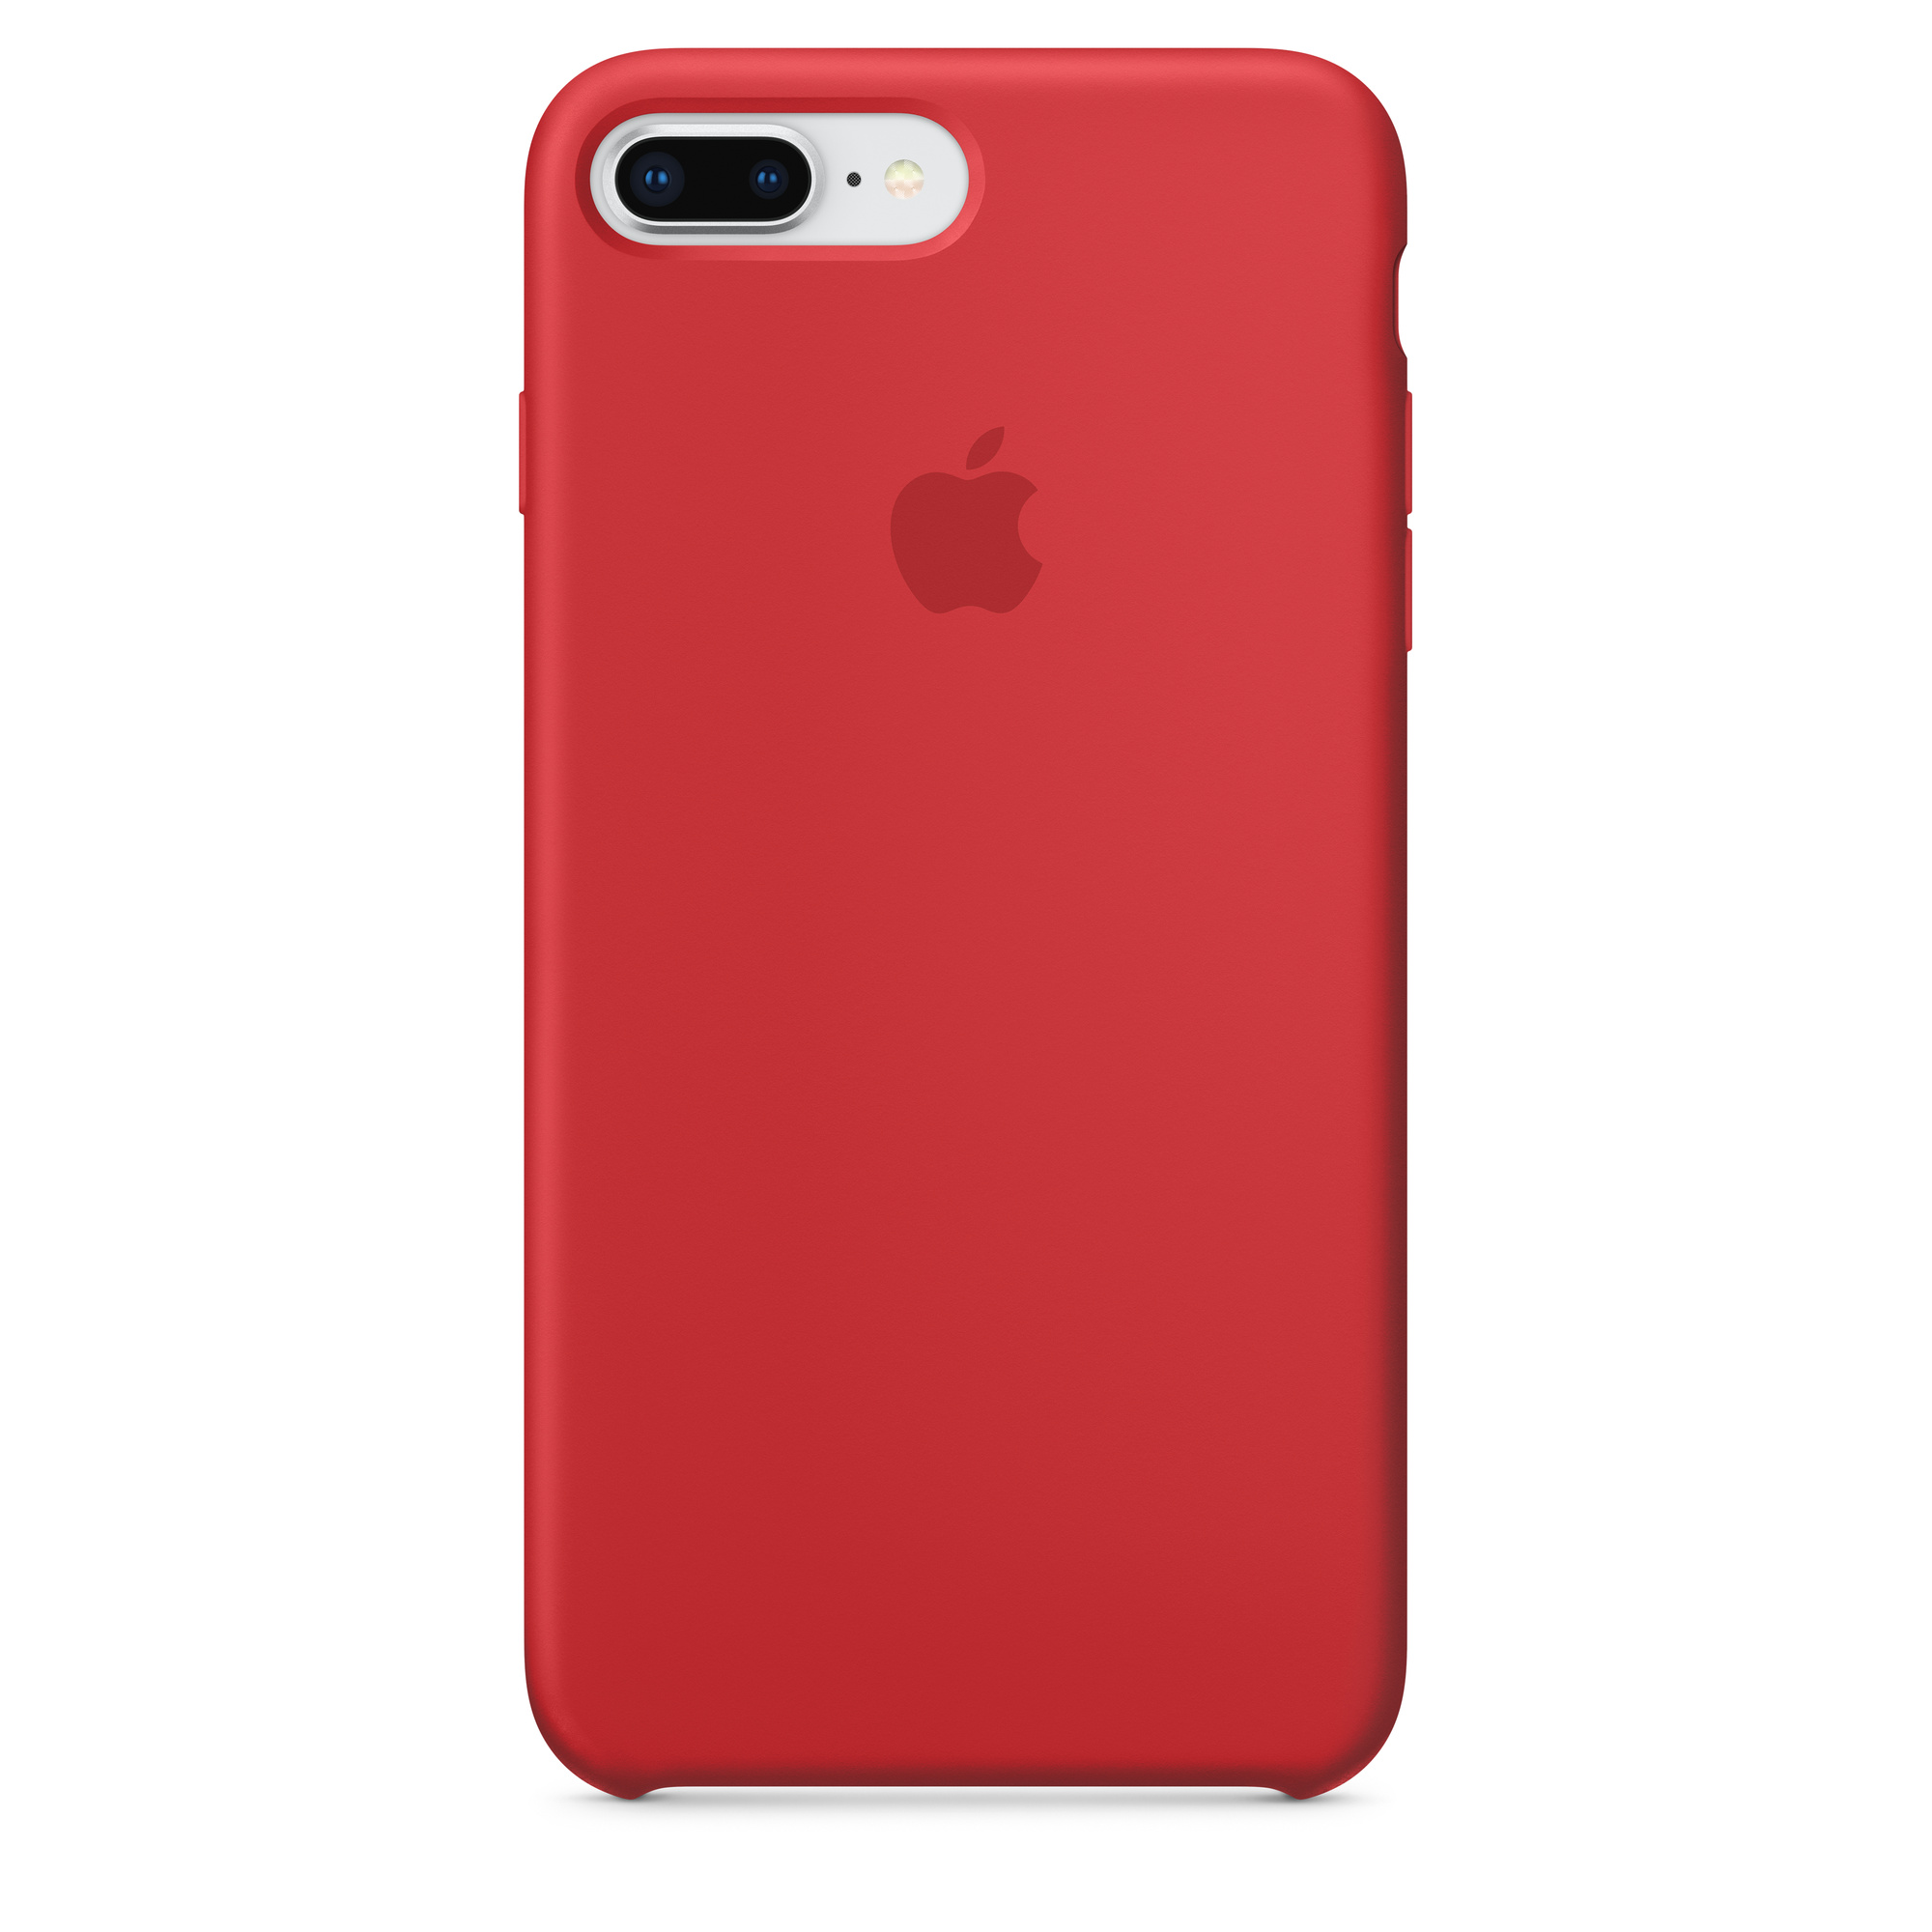 iPhone 8 Plus / 7 Plus Silicone Case — (PRODUCT)RED